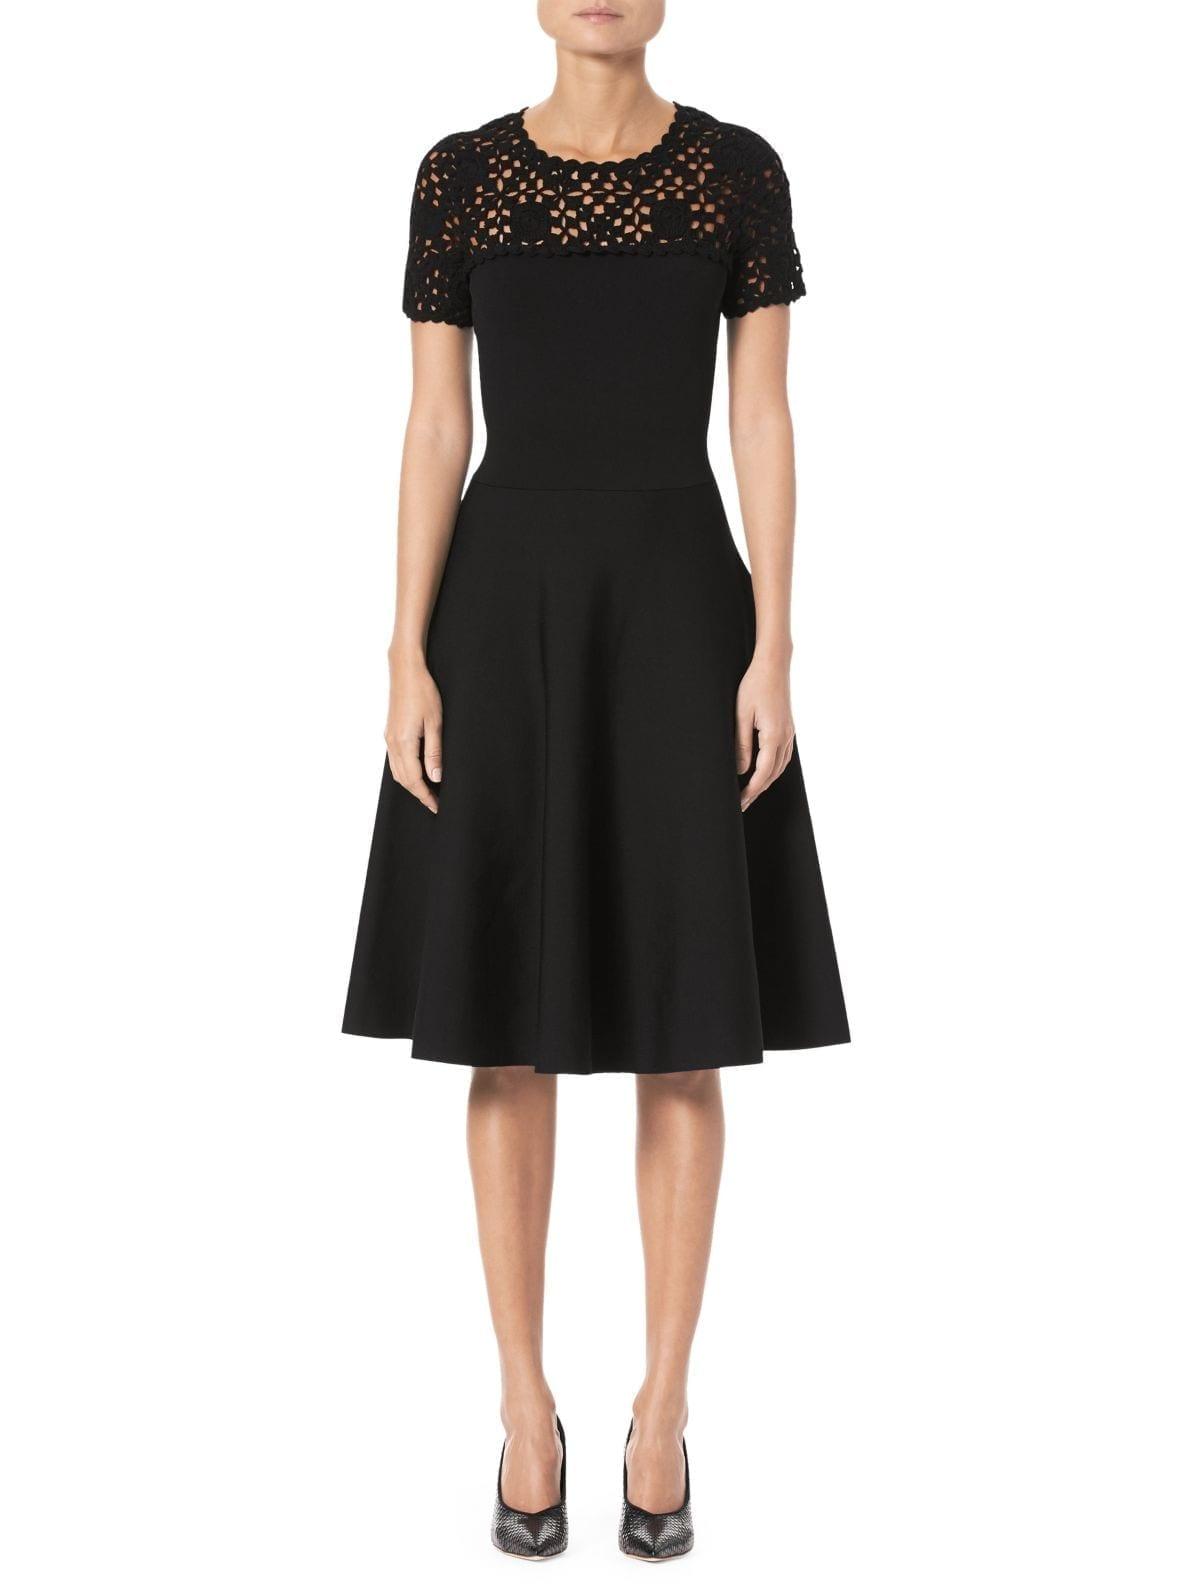 CAROLINA HERRERA Macramé Midi Black Dress